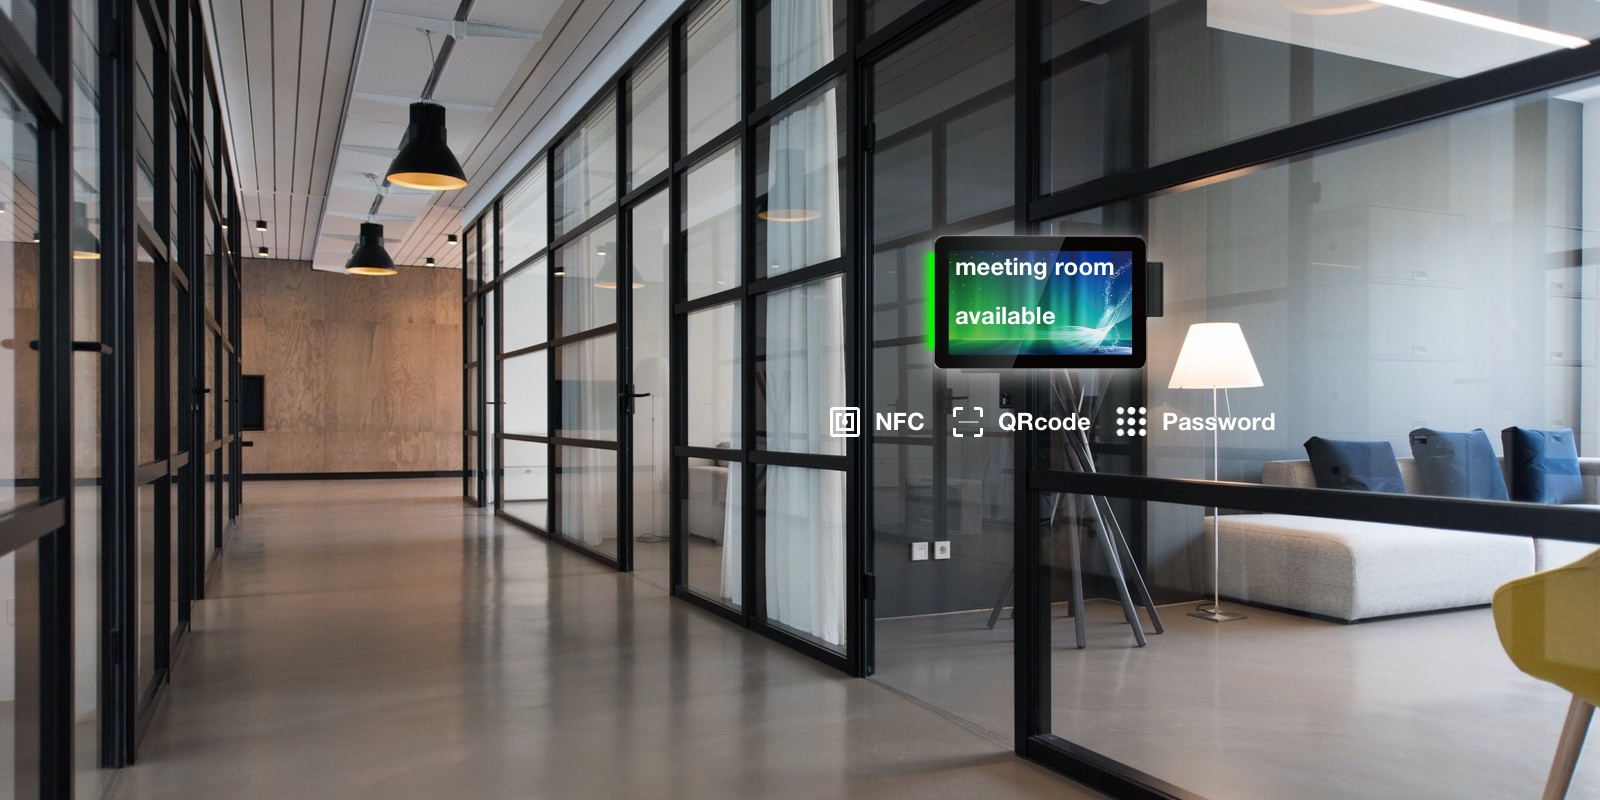 NFC Card Maker/Bluetooth Card Reader for smart hotel